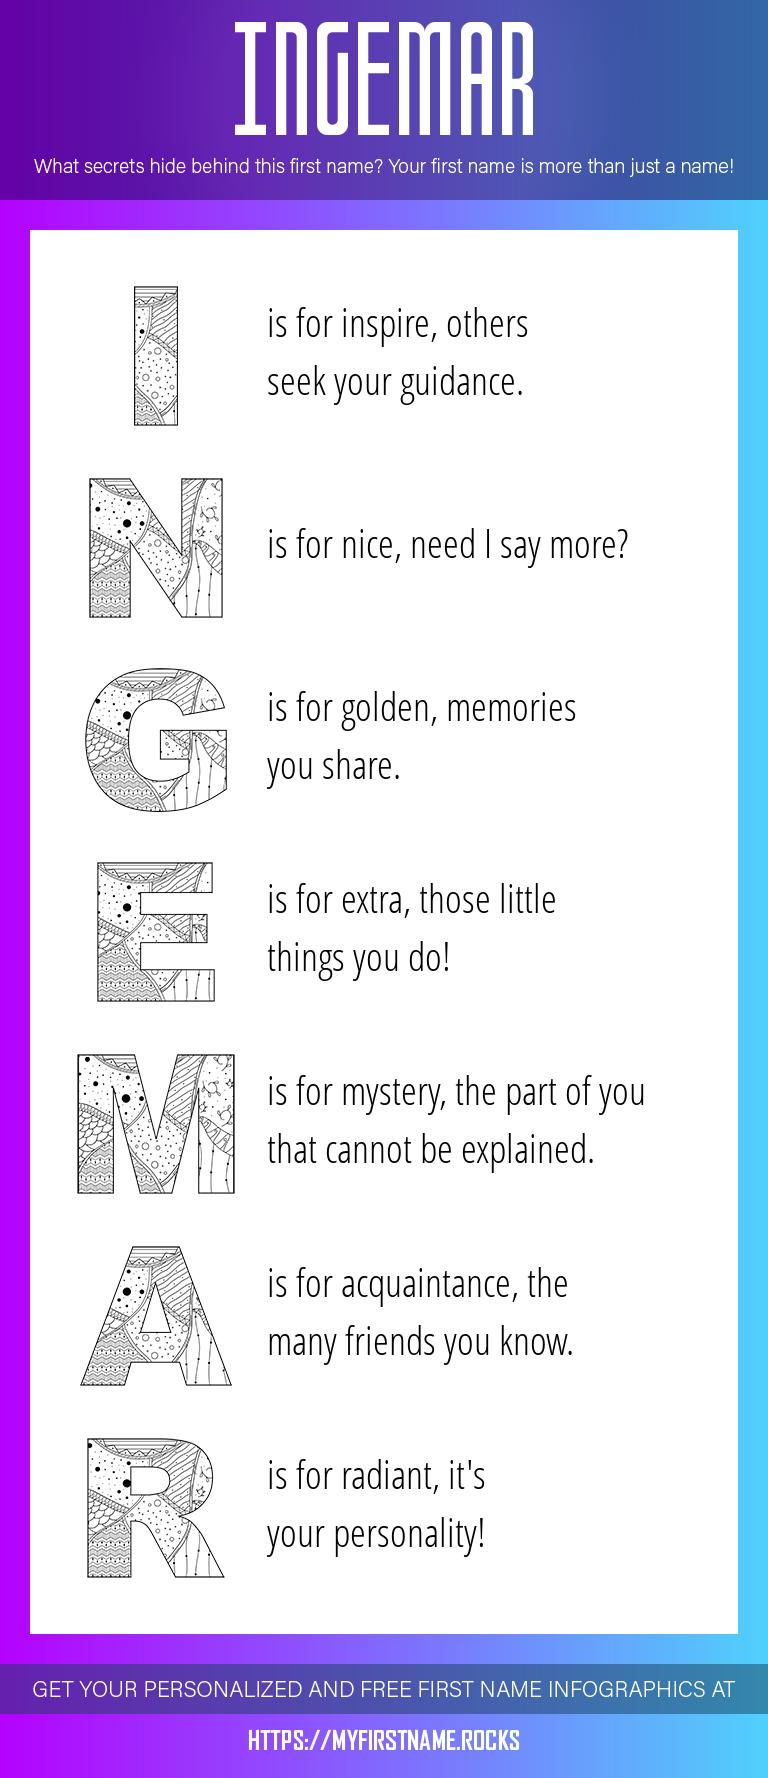 Ingemar Infographics